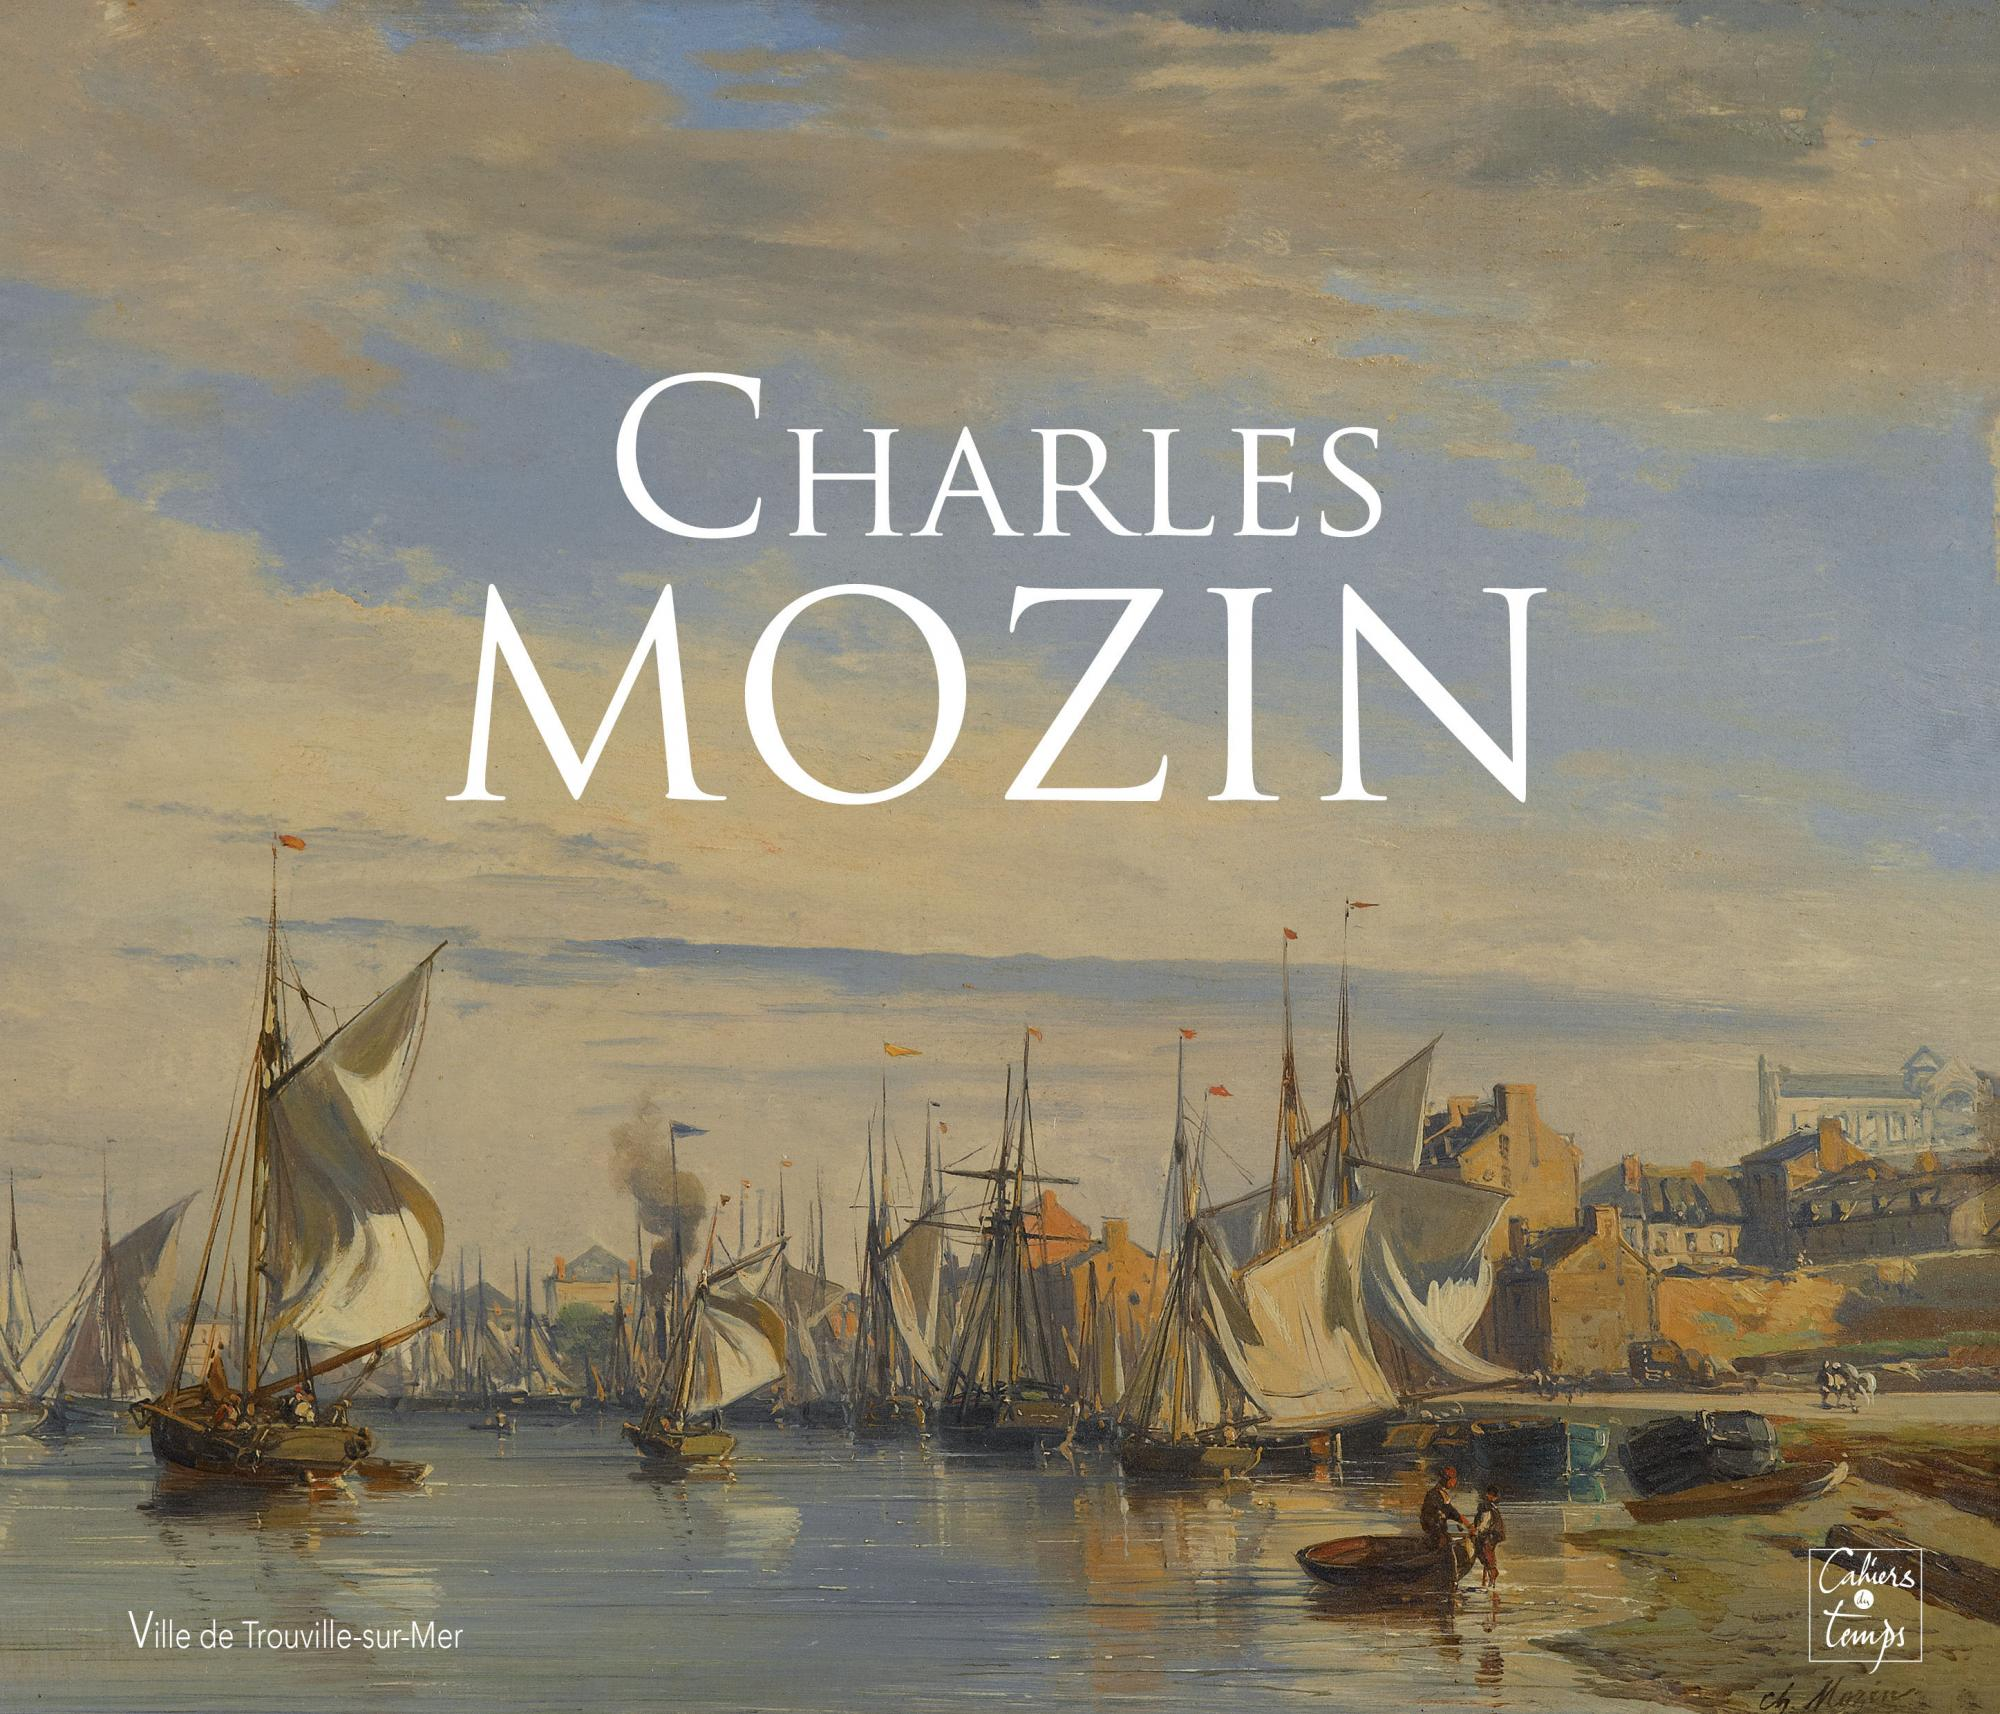 Charles Mozin